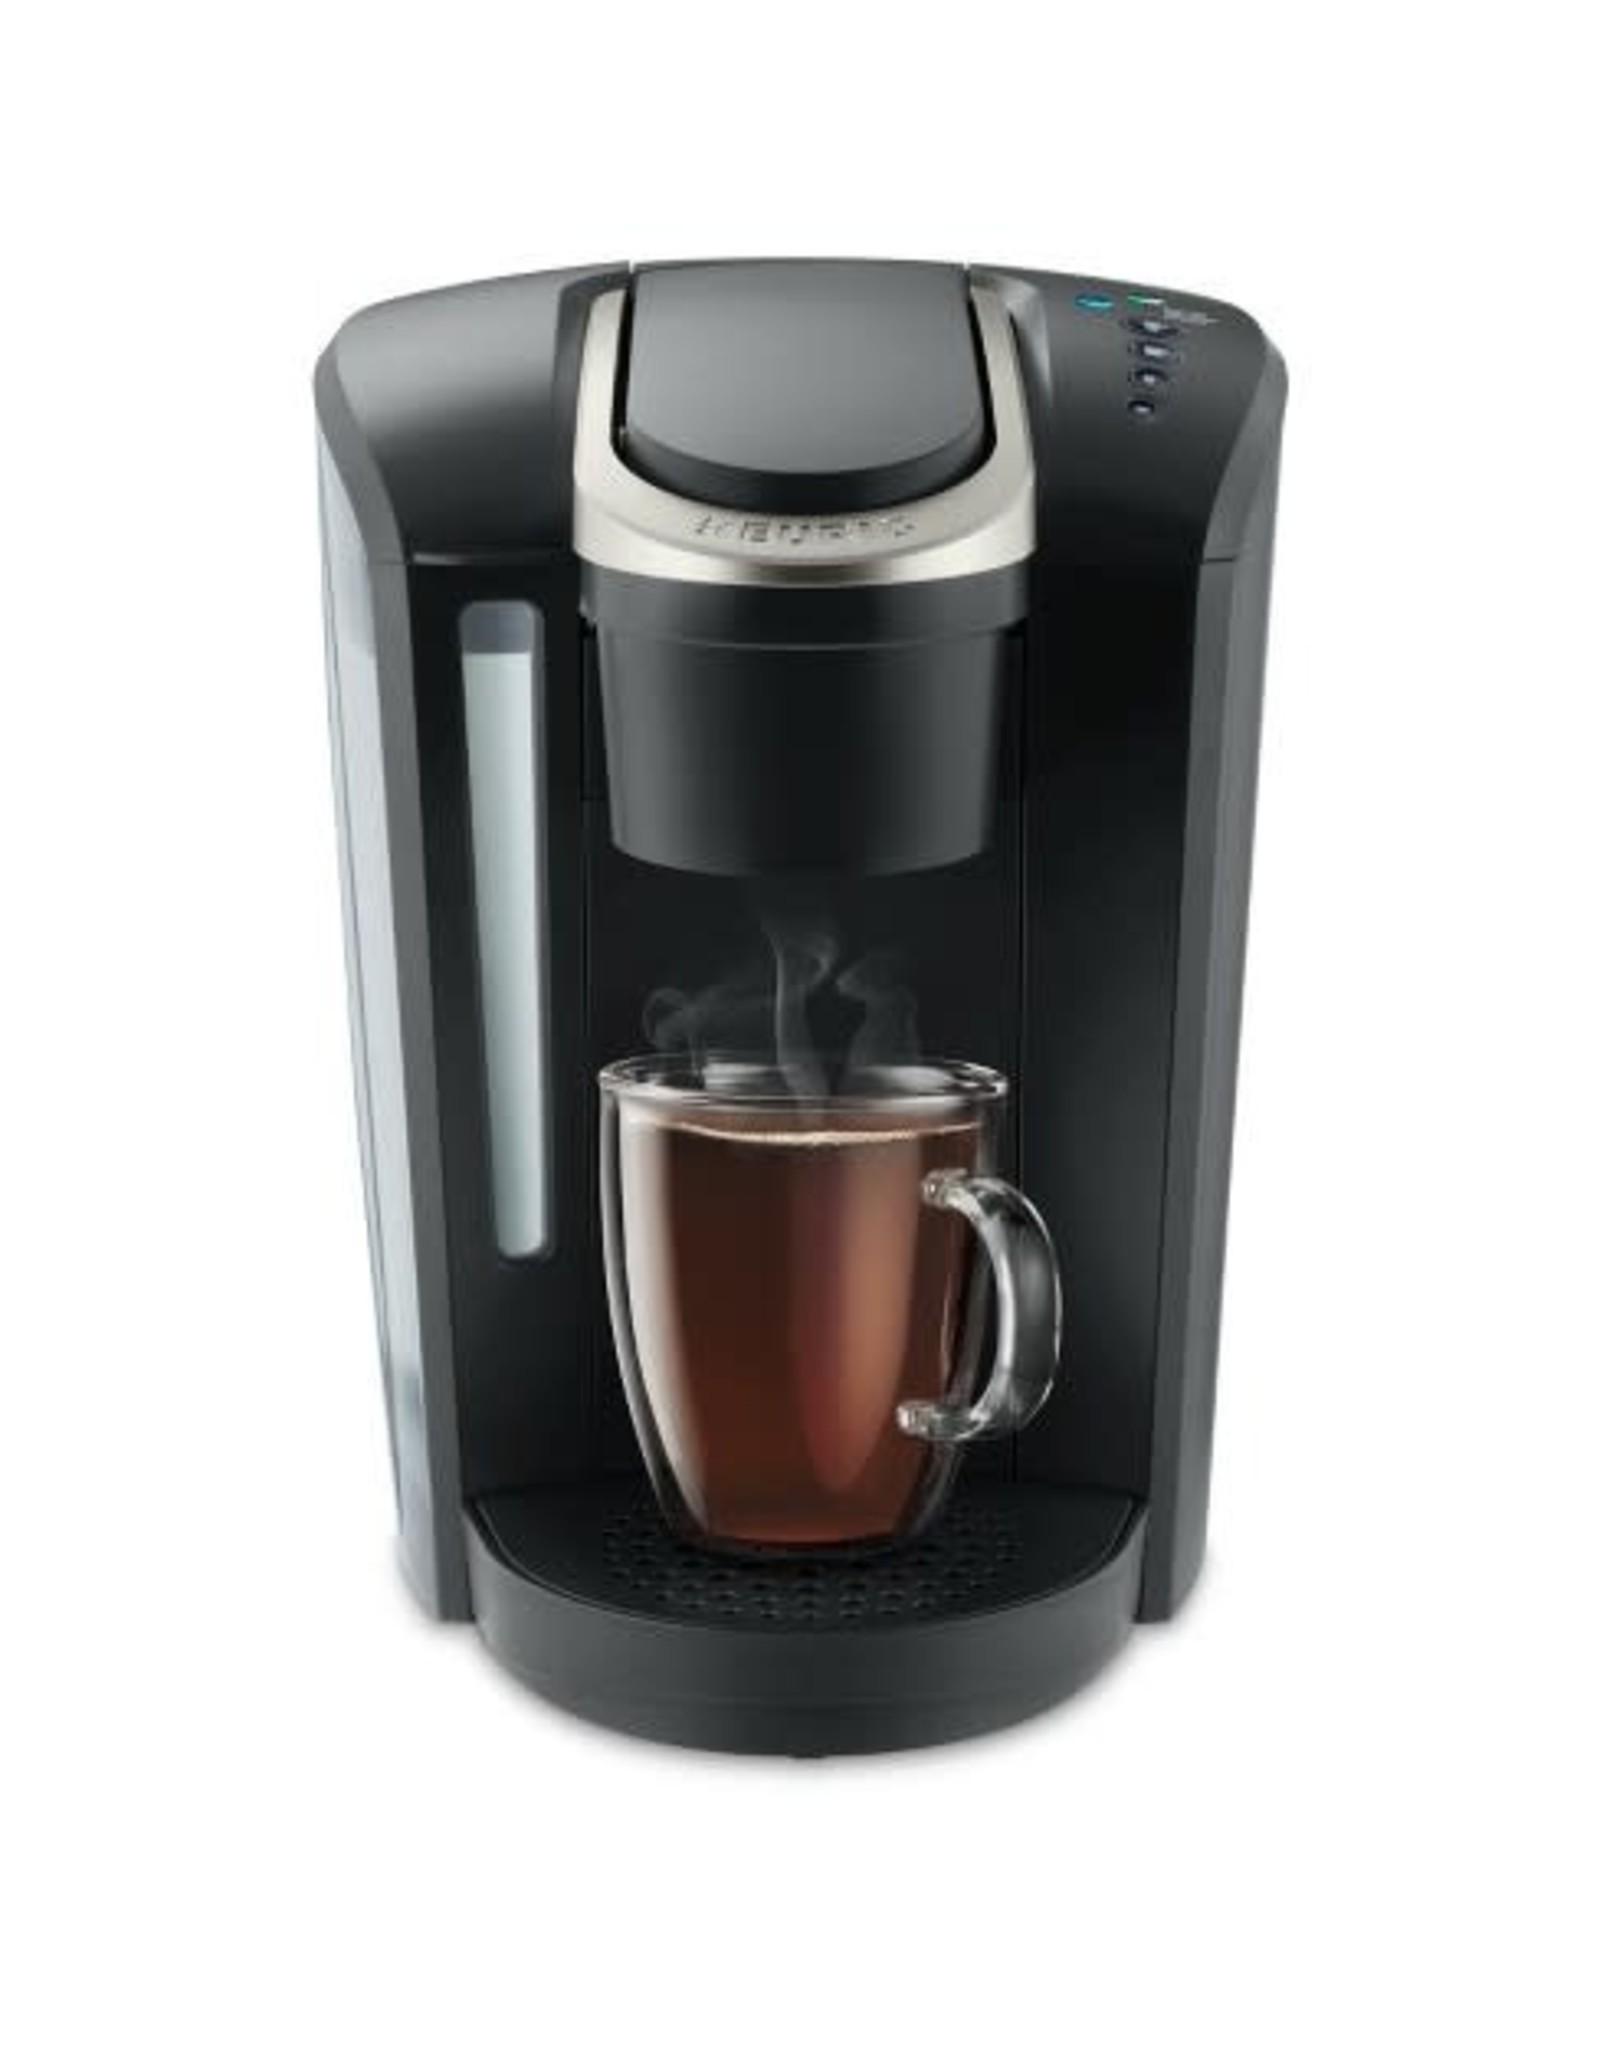 keurig Keurig - K-Select Single-Serve K-Cup Pod Coffee Maker - Matte Black